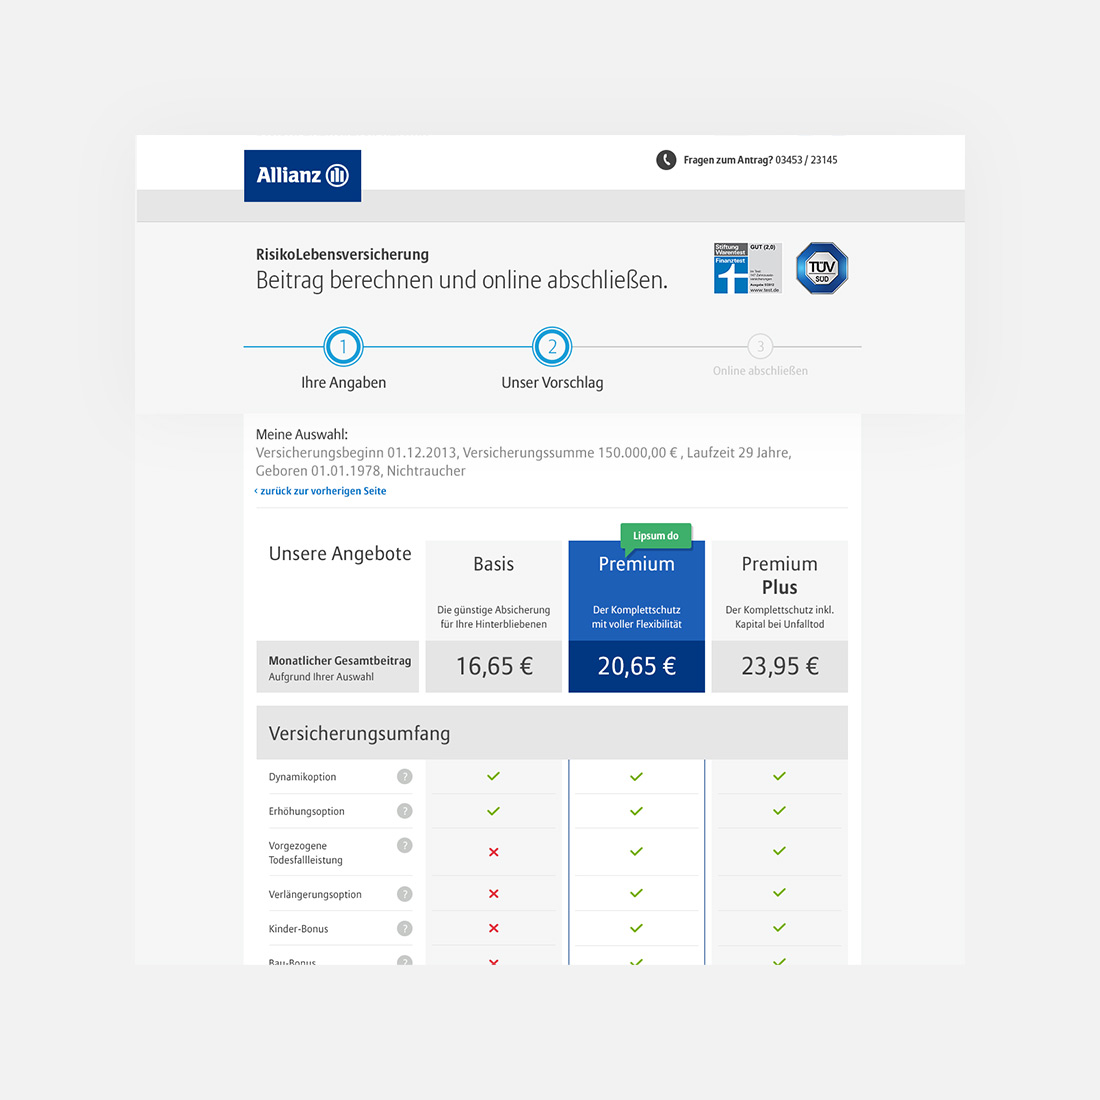 Allianz Risiko Lebensversicherung